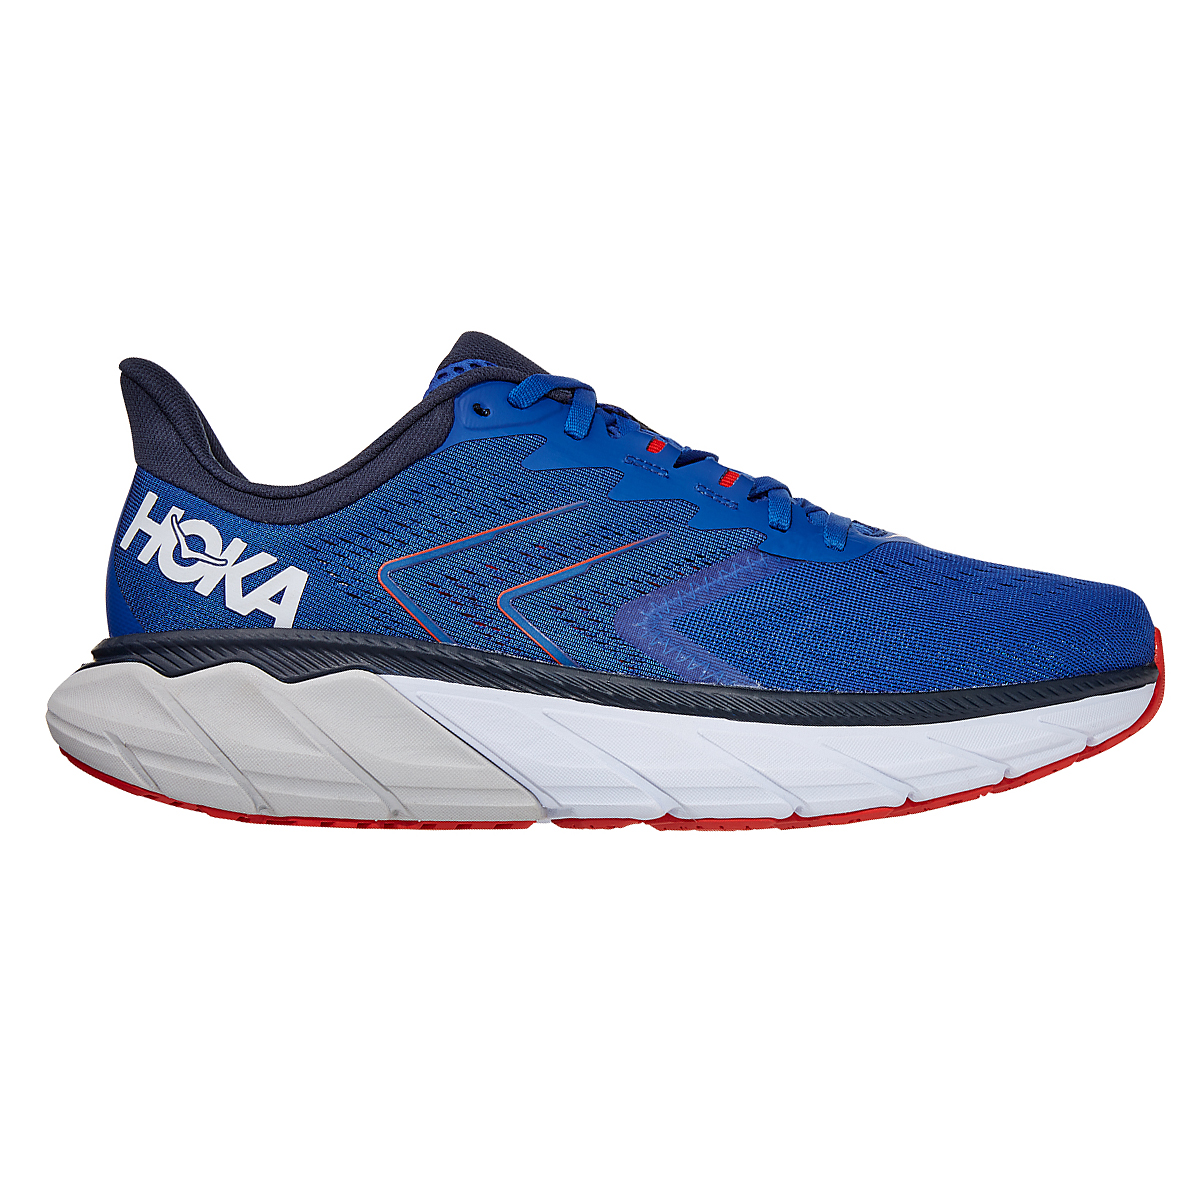 Men's Hoka One One Arahi 5 Running Shoe - Color: Turkish Sea/White - Size: 7 - Width: Regular, Turkish Sea/White, large, image 1